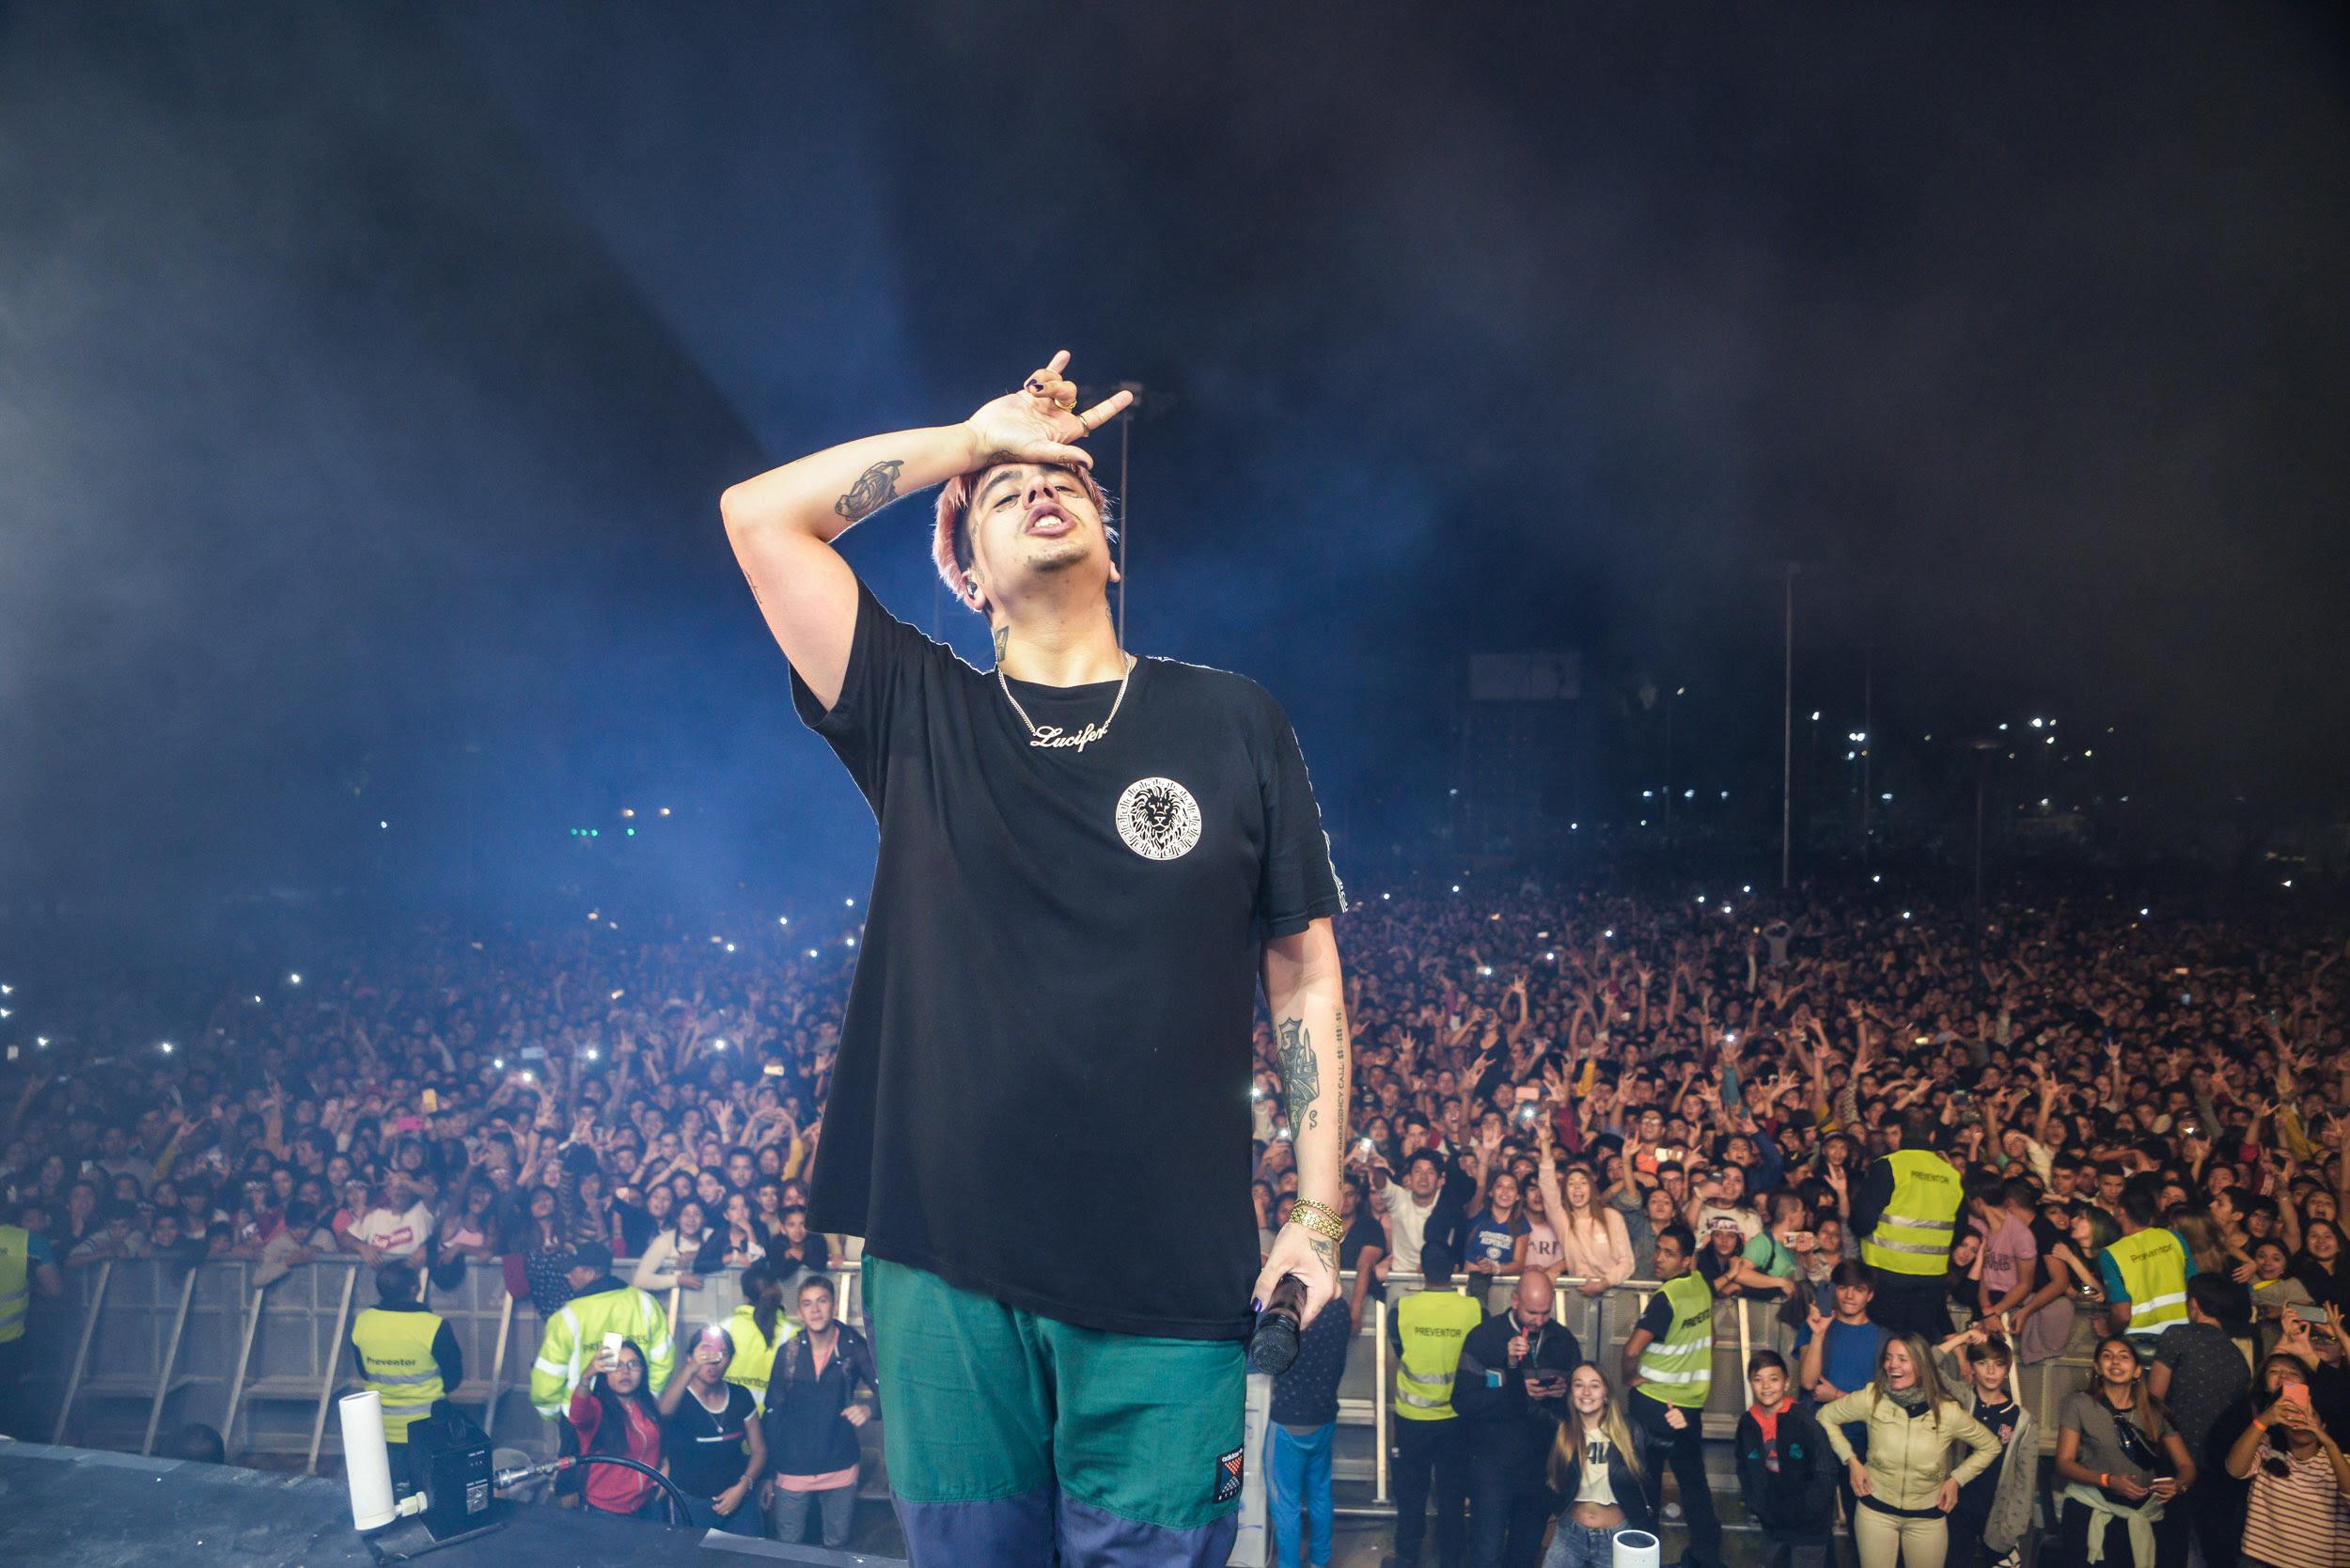 Conoce a Tiago PZK, un cantante de trap argentino